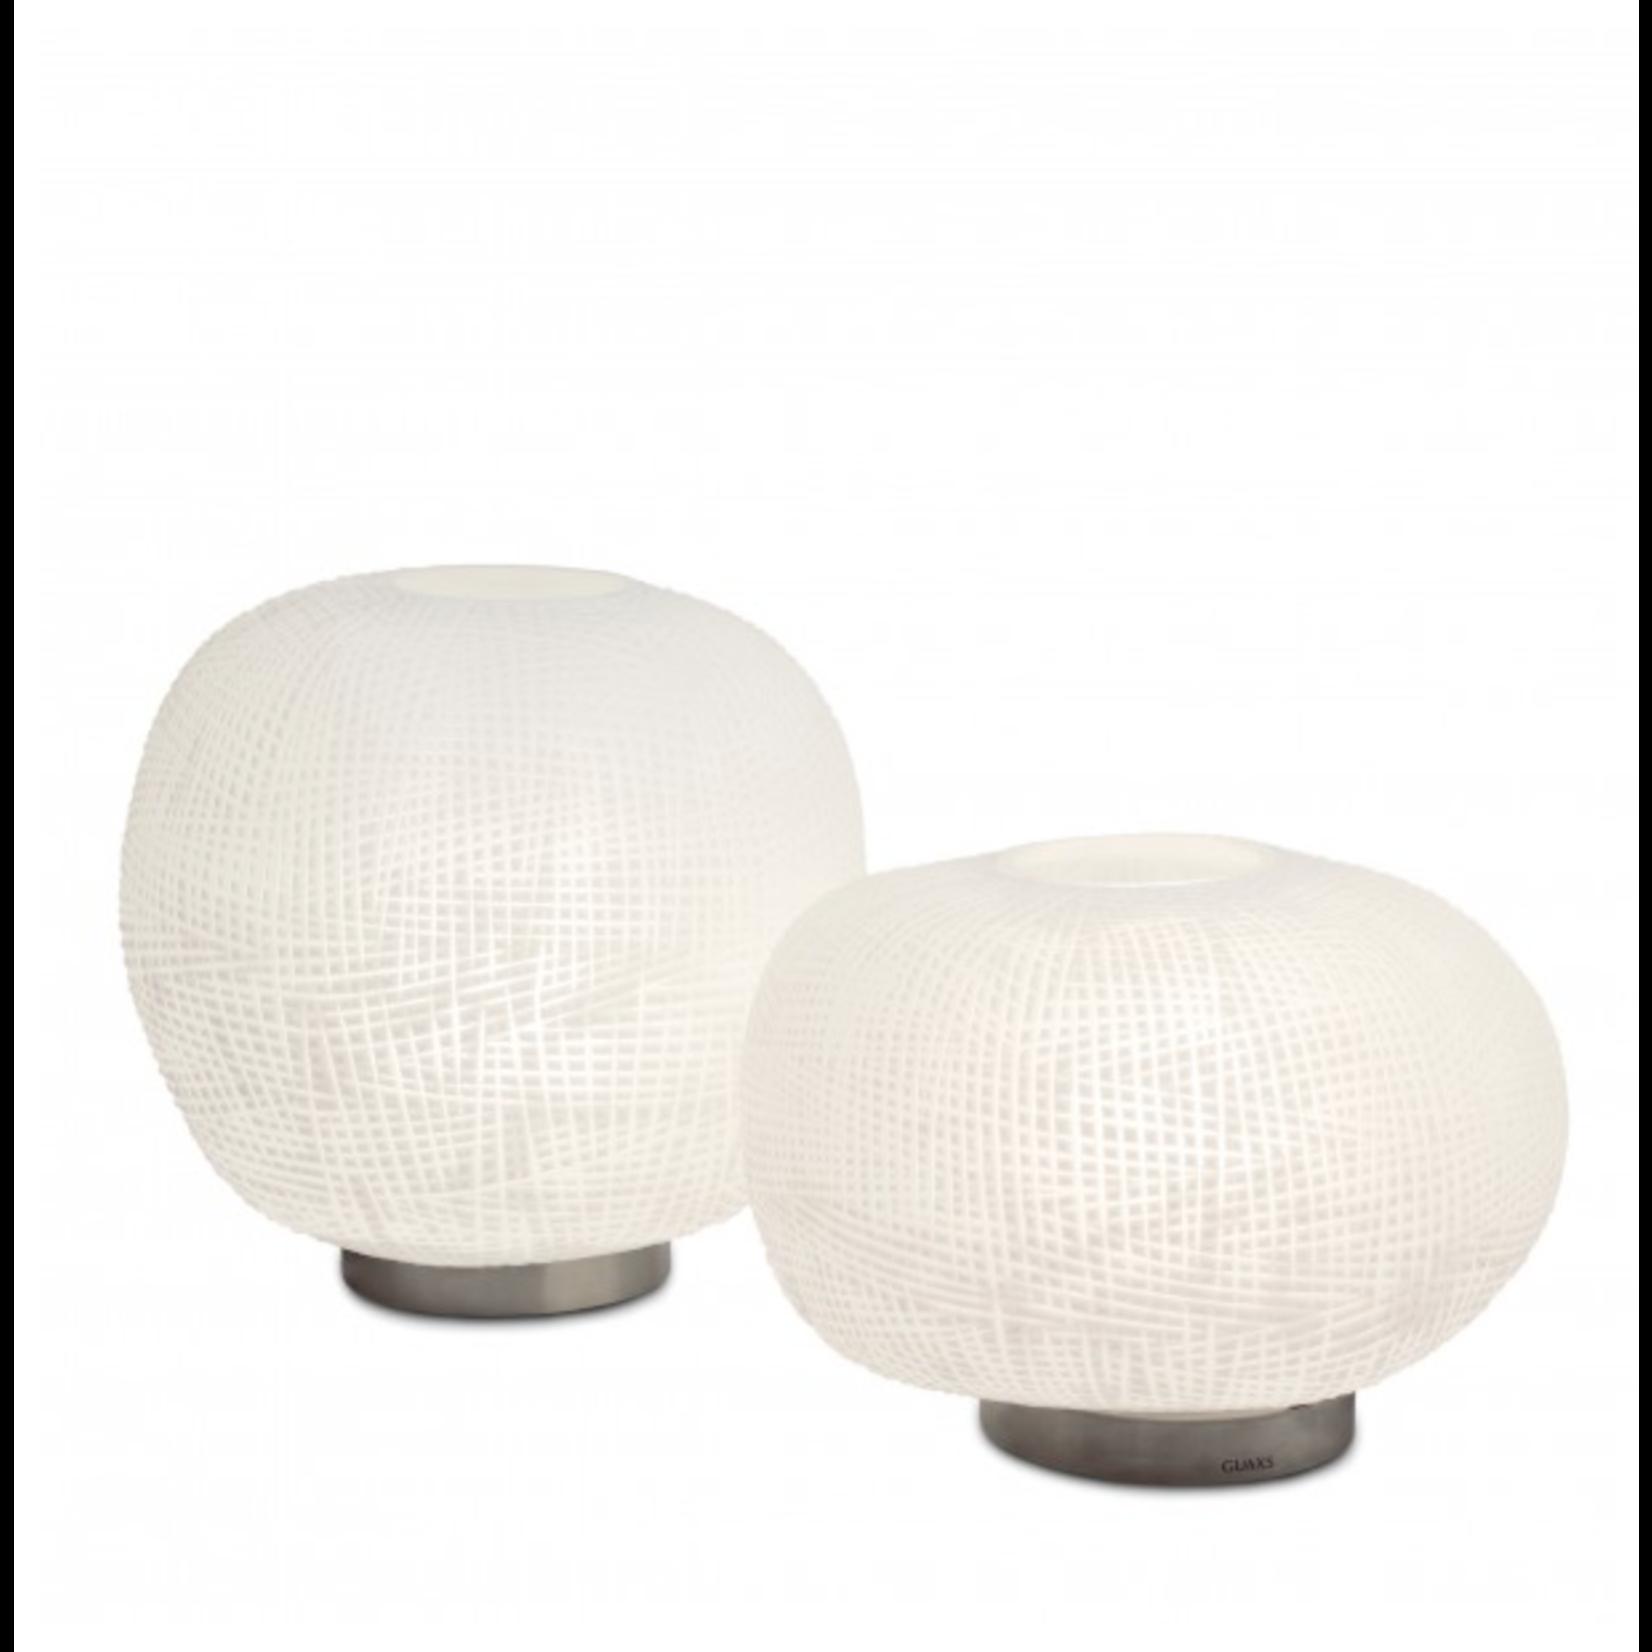 Guaxs Tafellamp Erbse 2   Clear / Opal